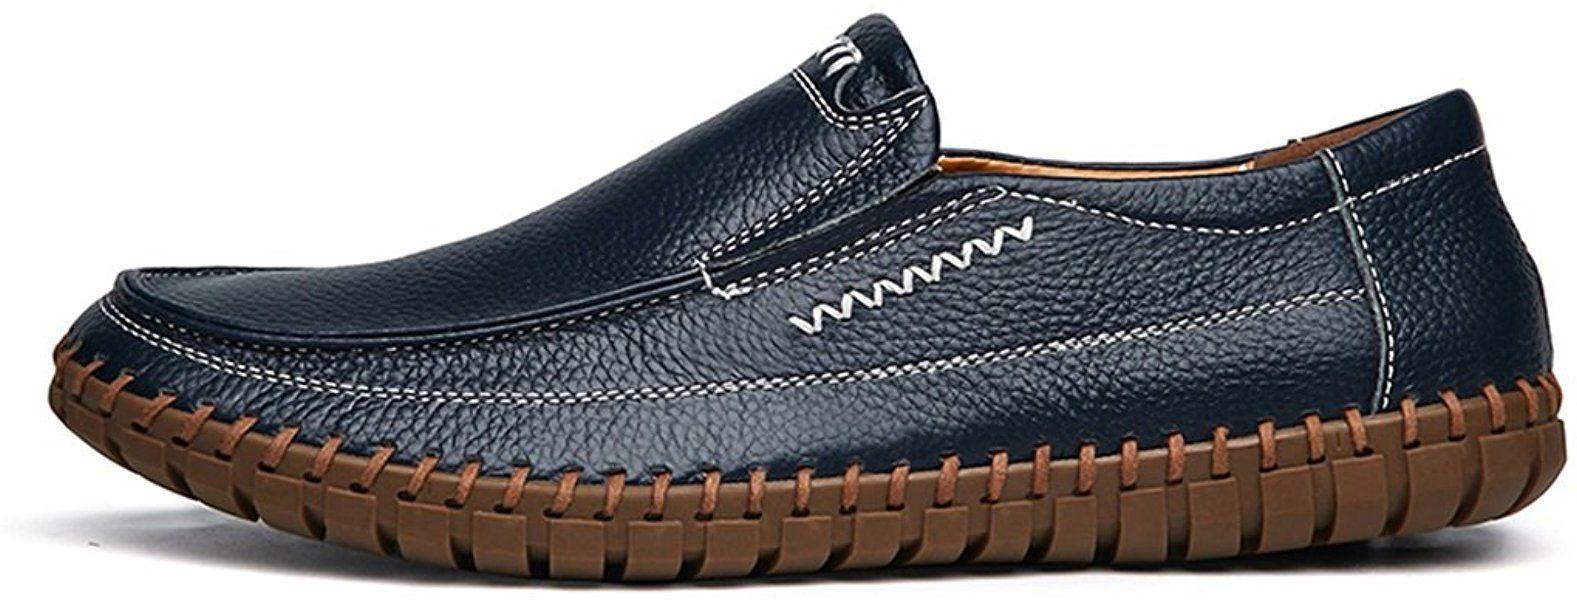 53bf9b2dae1b1 Amazon.com | Handmade Summer Men's Leather Shoes Casual Slip On ...